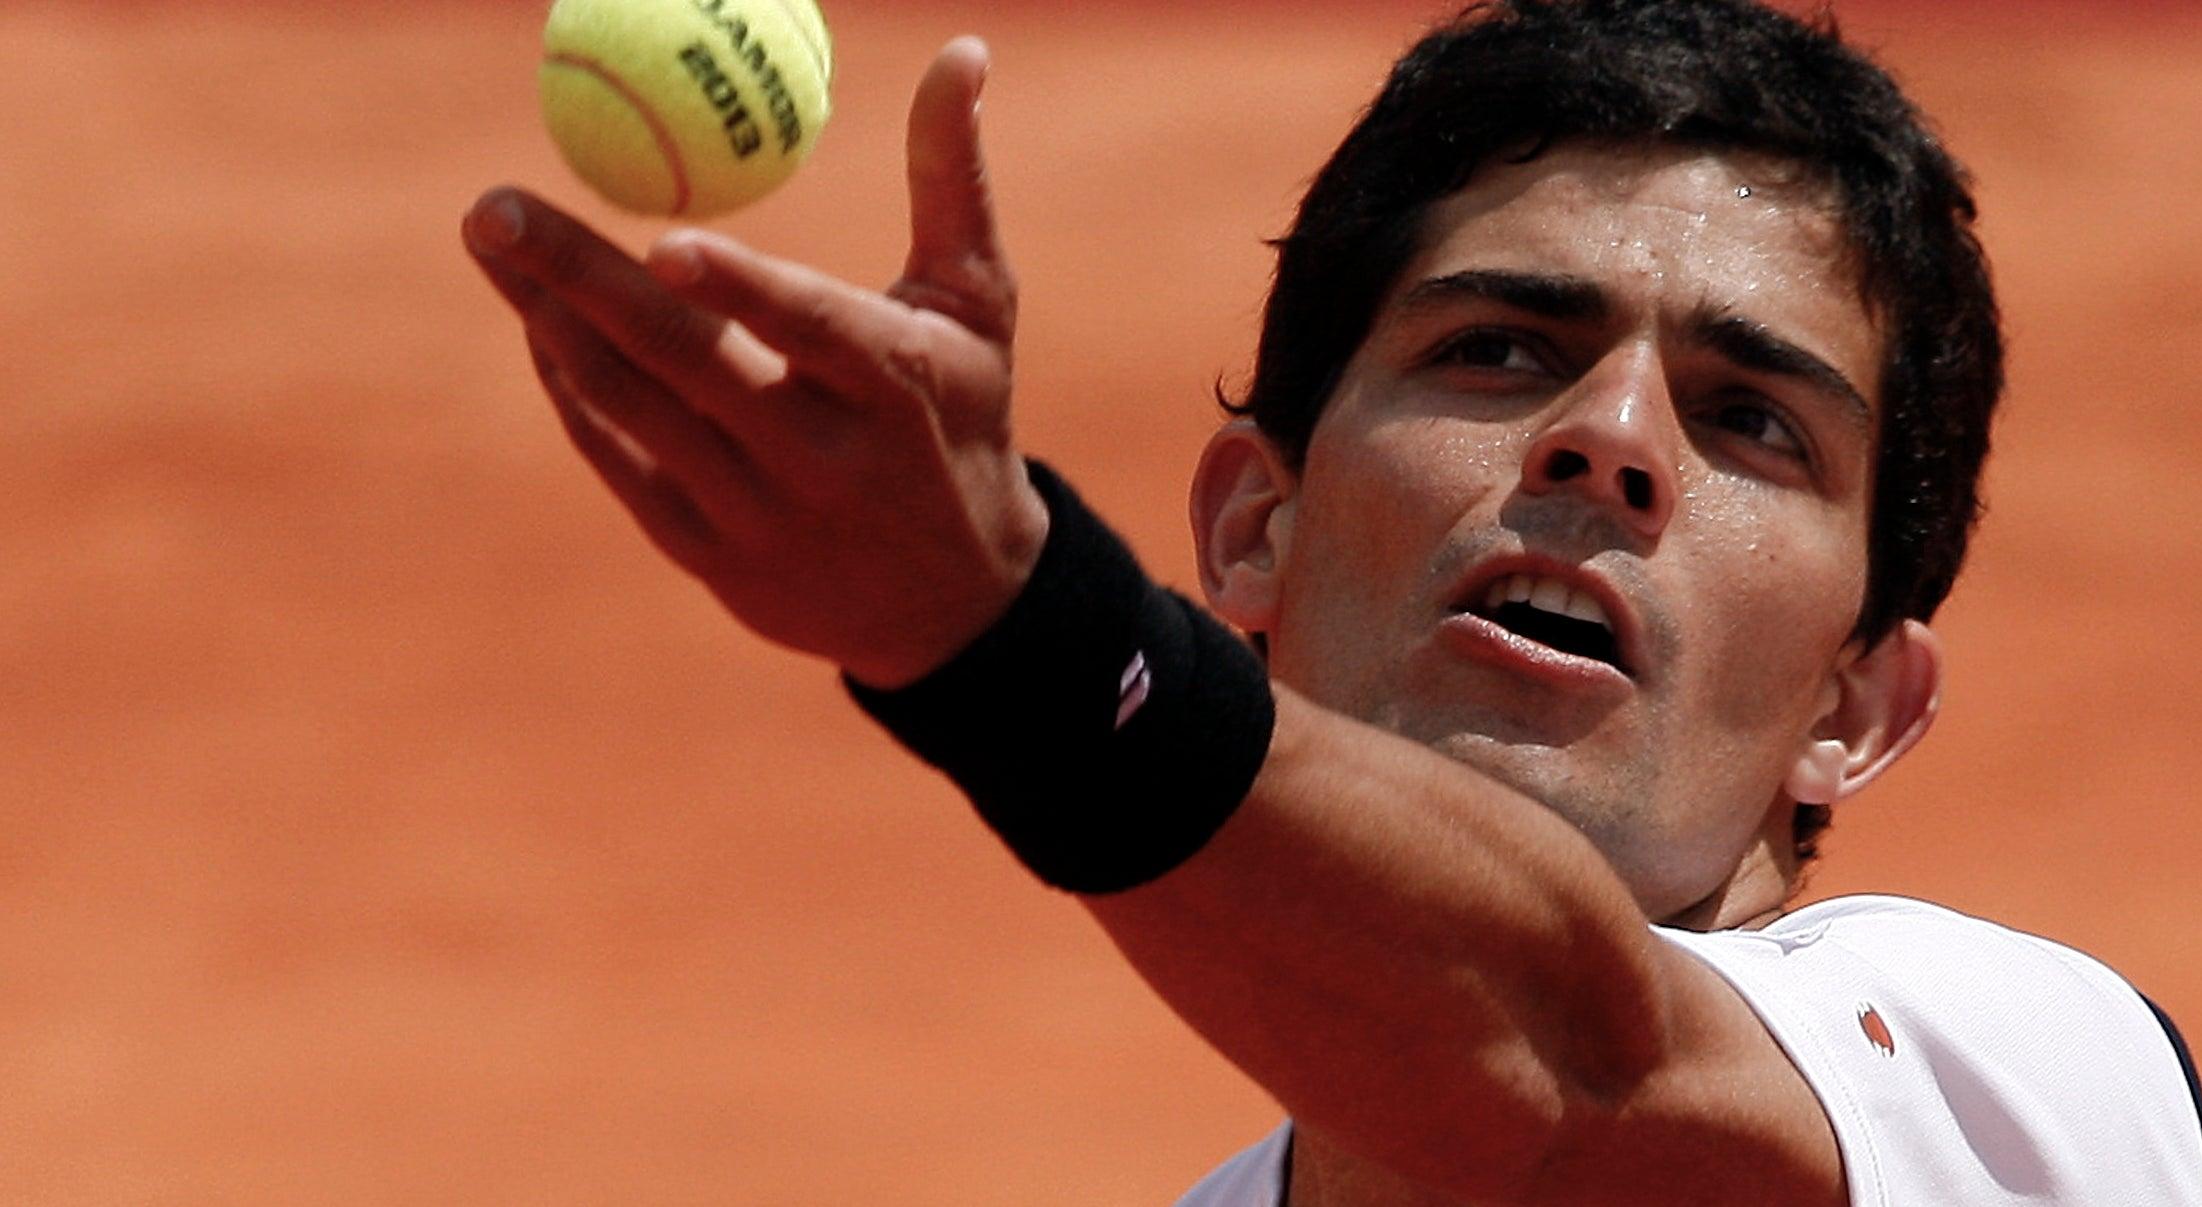 Rui Machado apurado no Open da Austr�lia